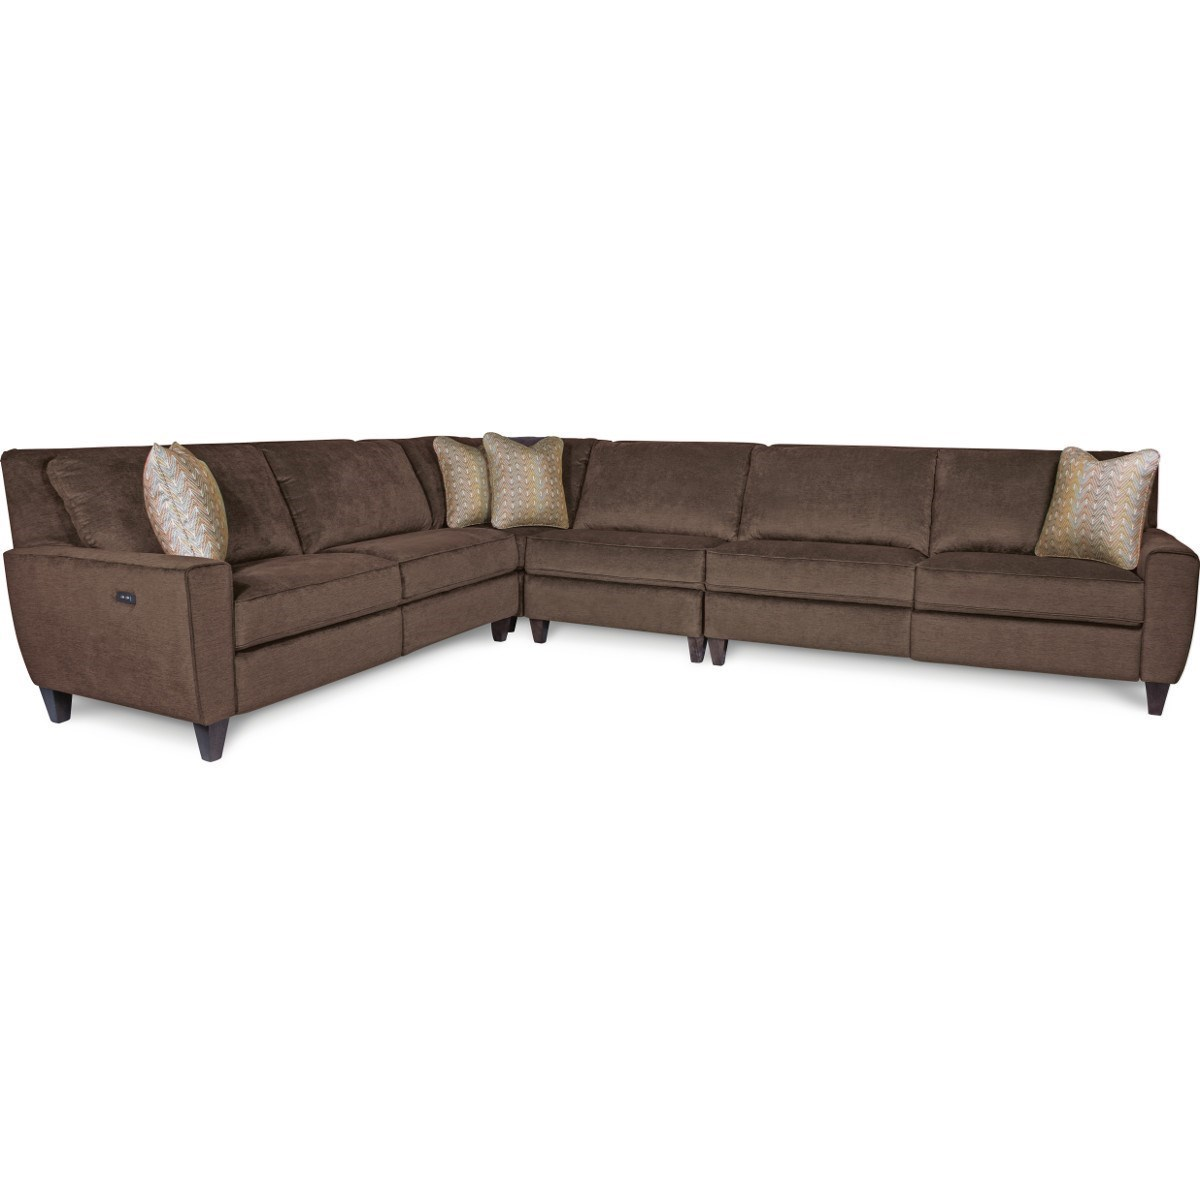 4 piece recliner sectional sofa portable chair la z boy edie four power reclining